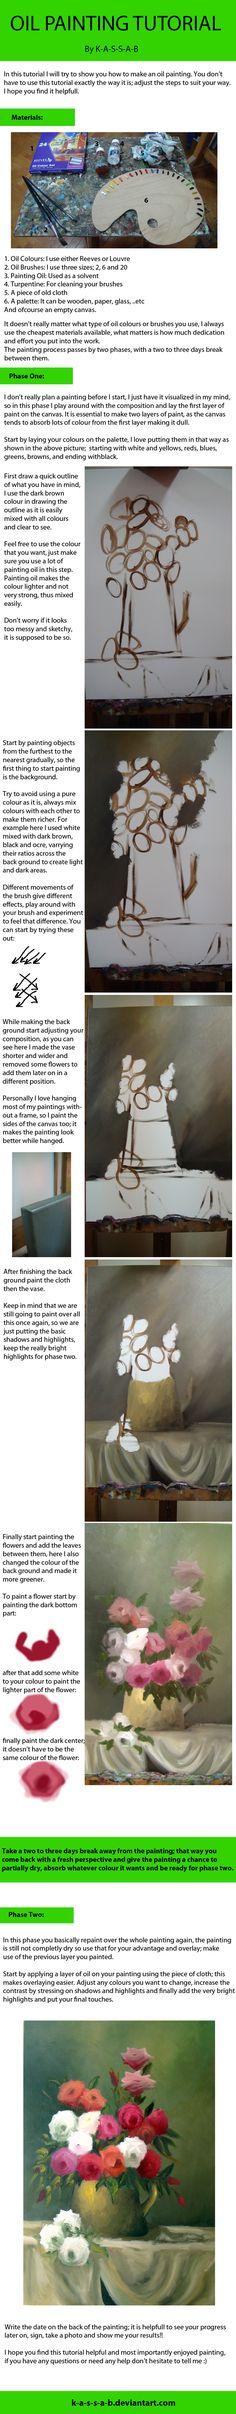 Oil Painting Tutorial by K-A-S-S-A-B.deviantart.com on @deviantART